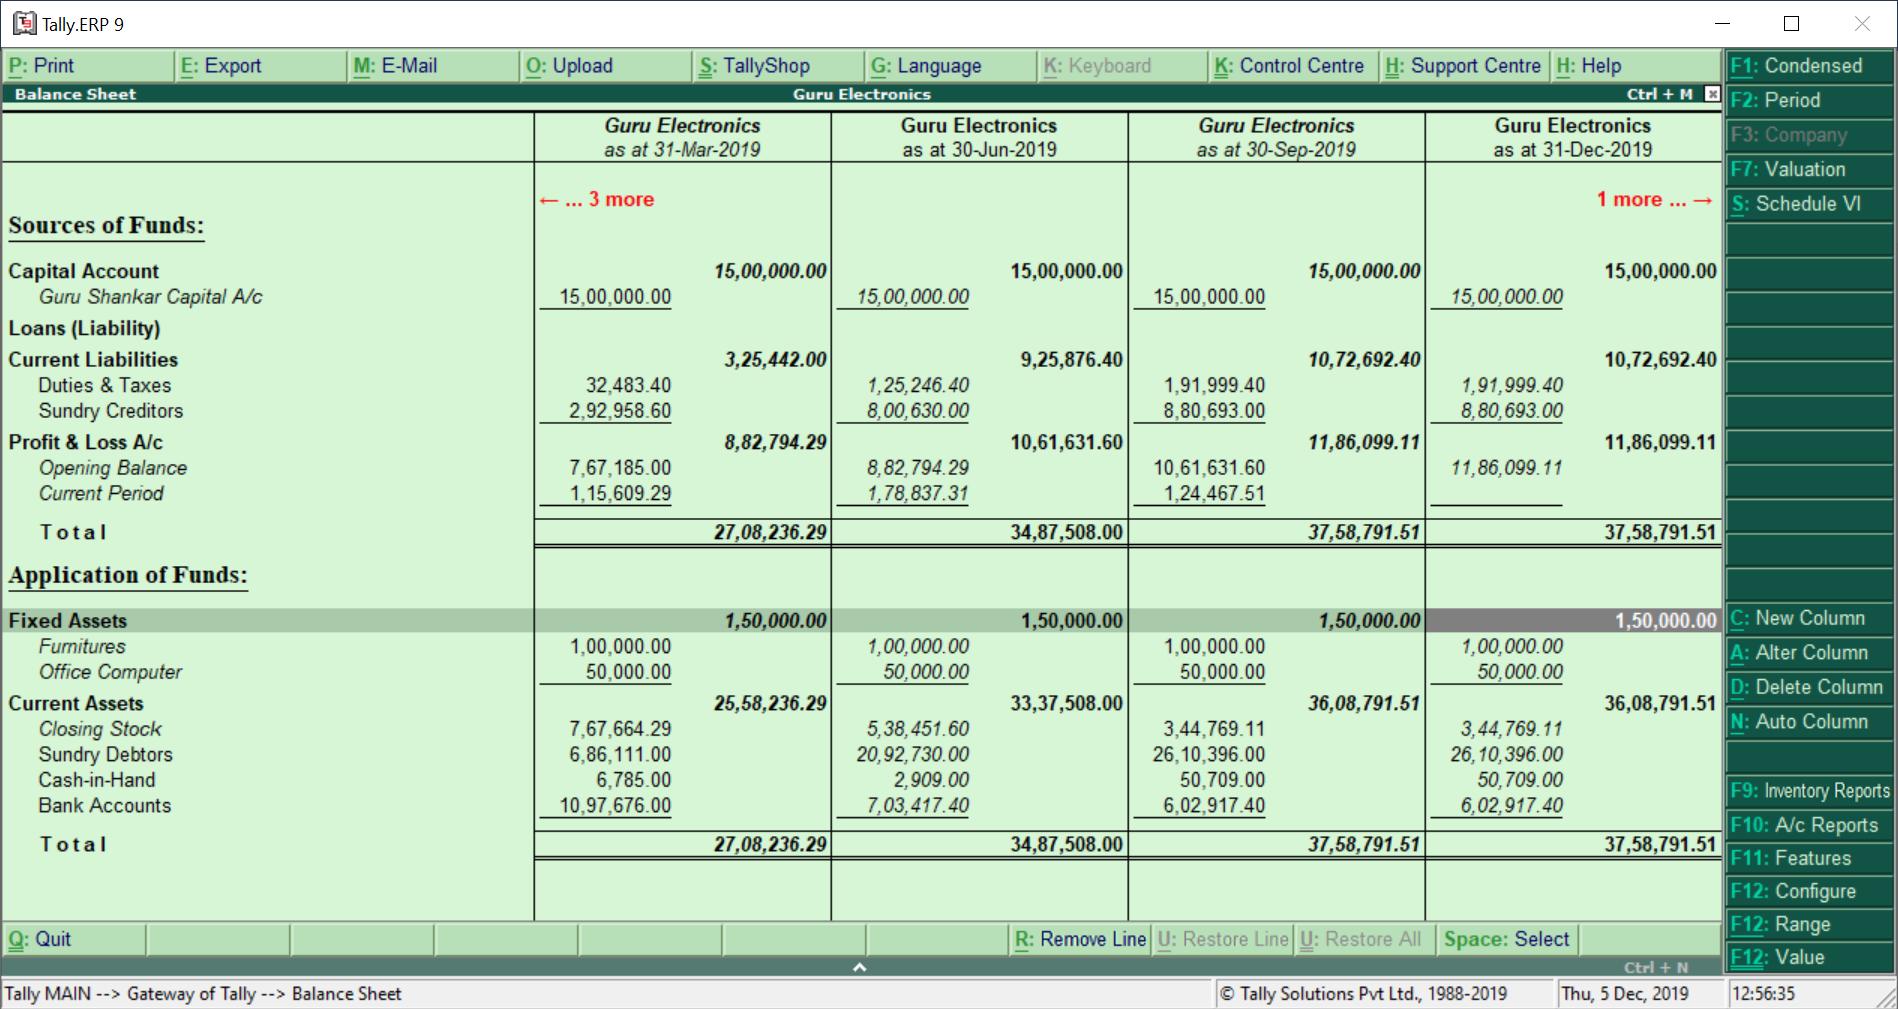 Quarterly Comparative Balance Sheet